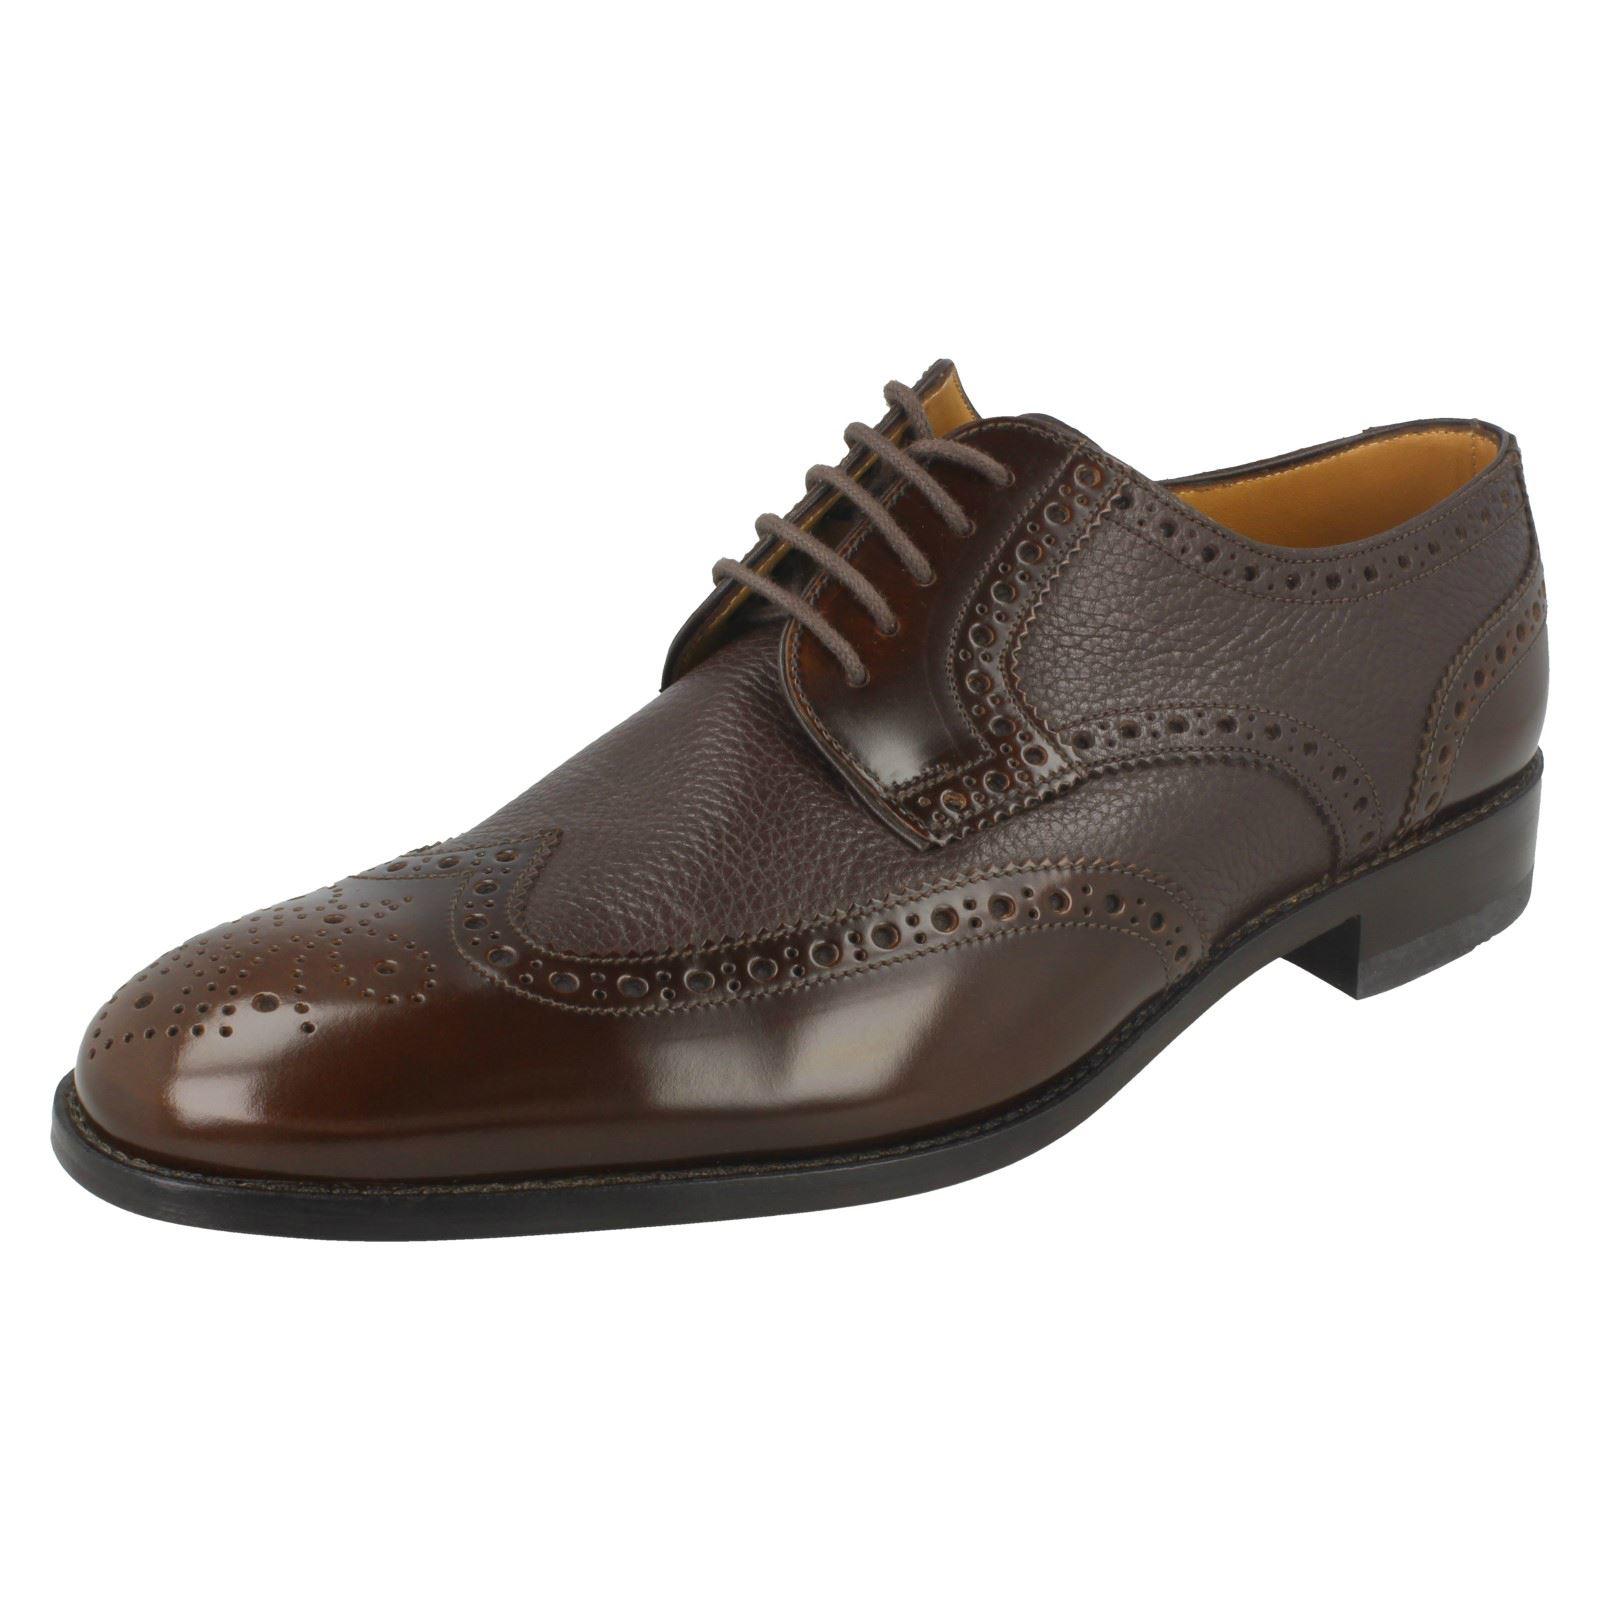 Mens Loake Lace Up Brogue Shoes